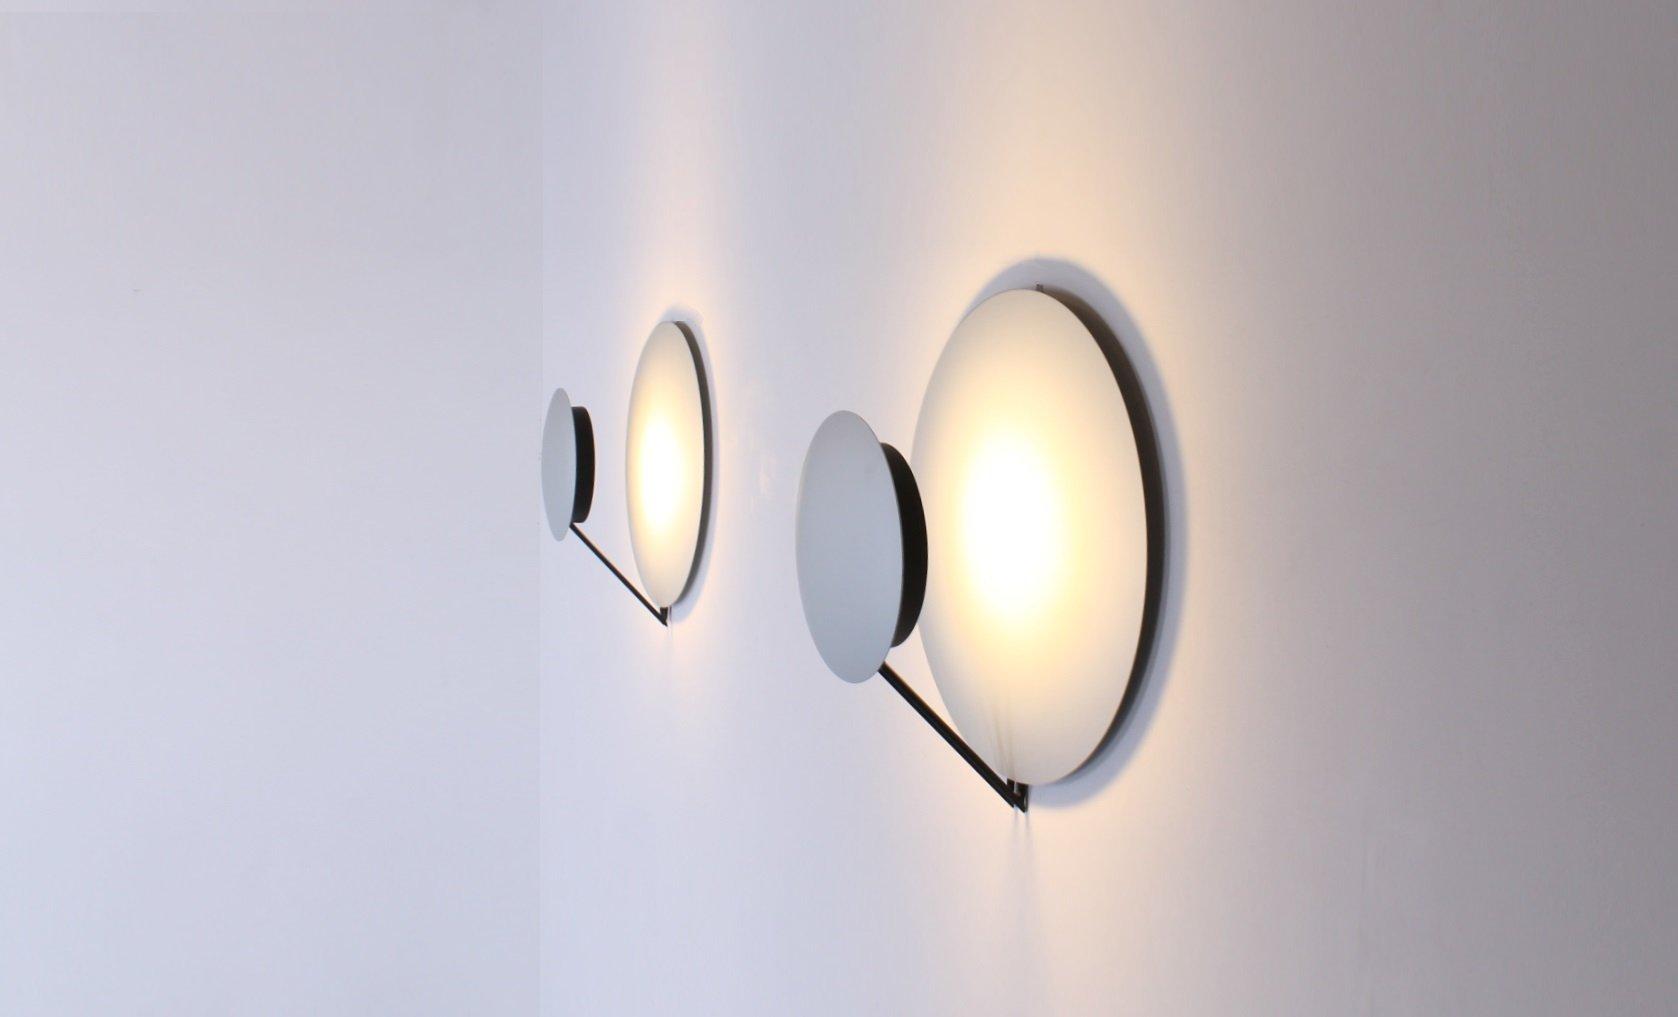 italienische aluminium vega wandlampe von cesaro amico f r tre ci luce 1980er bei pamono kaufen. Black Bedroom Furniture Sets. Home Design Ideas